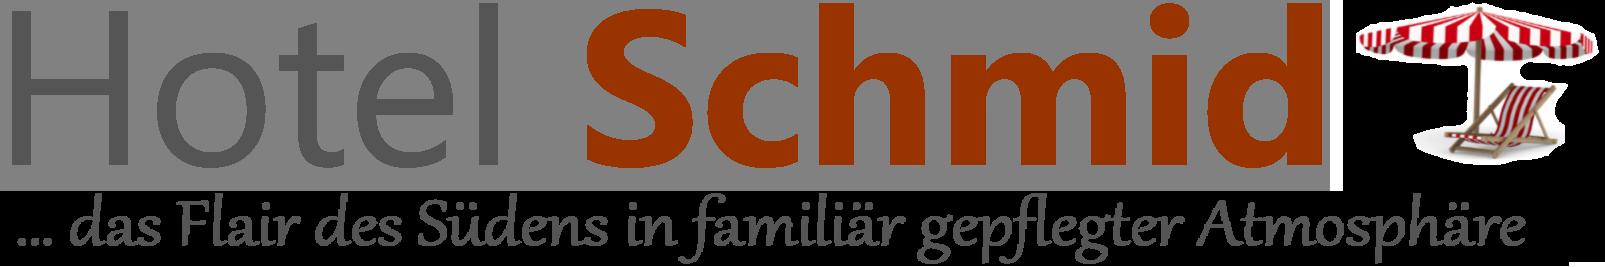 Hotel Schmid | Flair des Südens in familiär gepflegter Atmosphäre